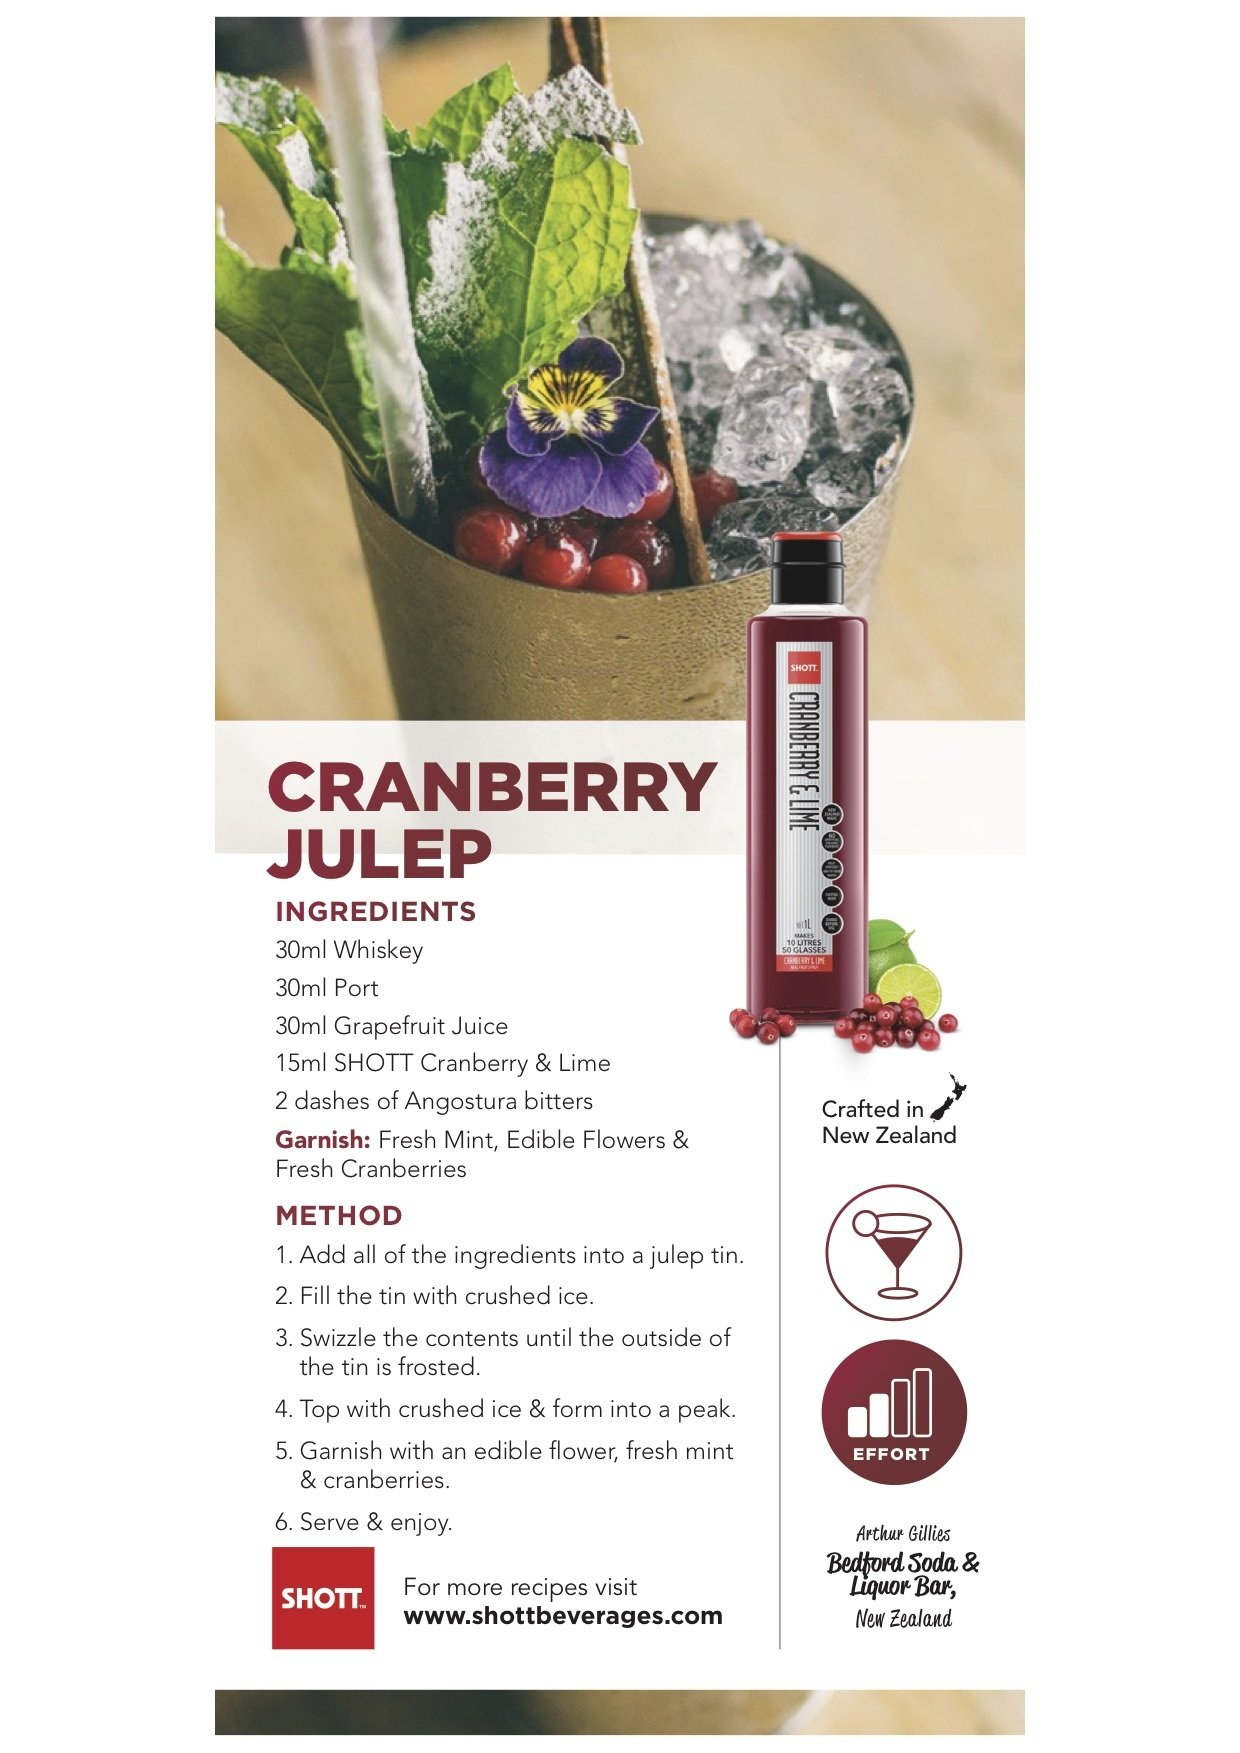 SHOTT Cranberry & Lime